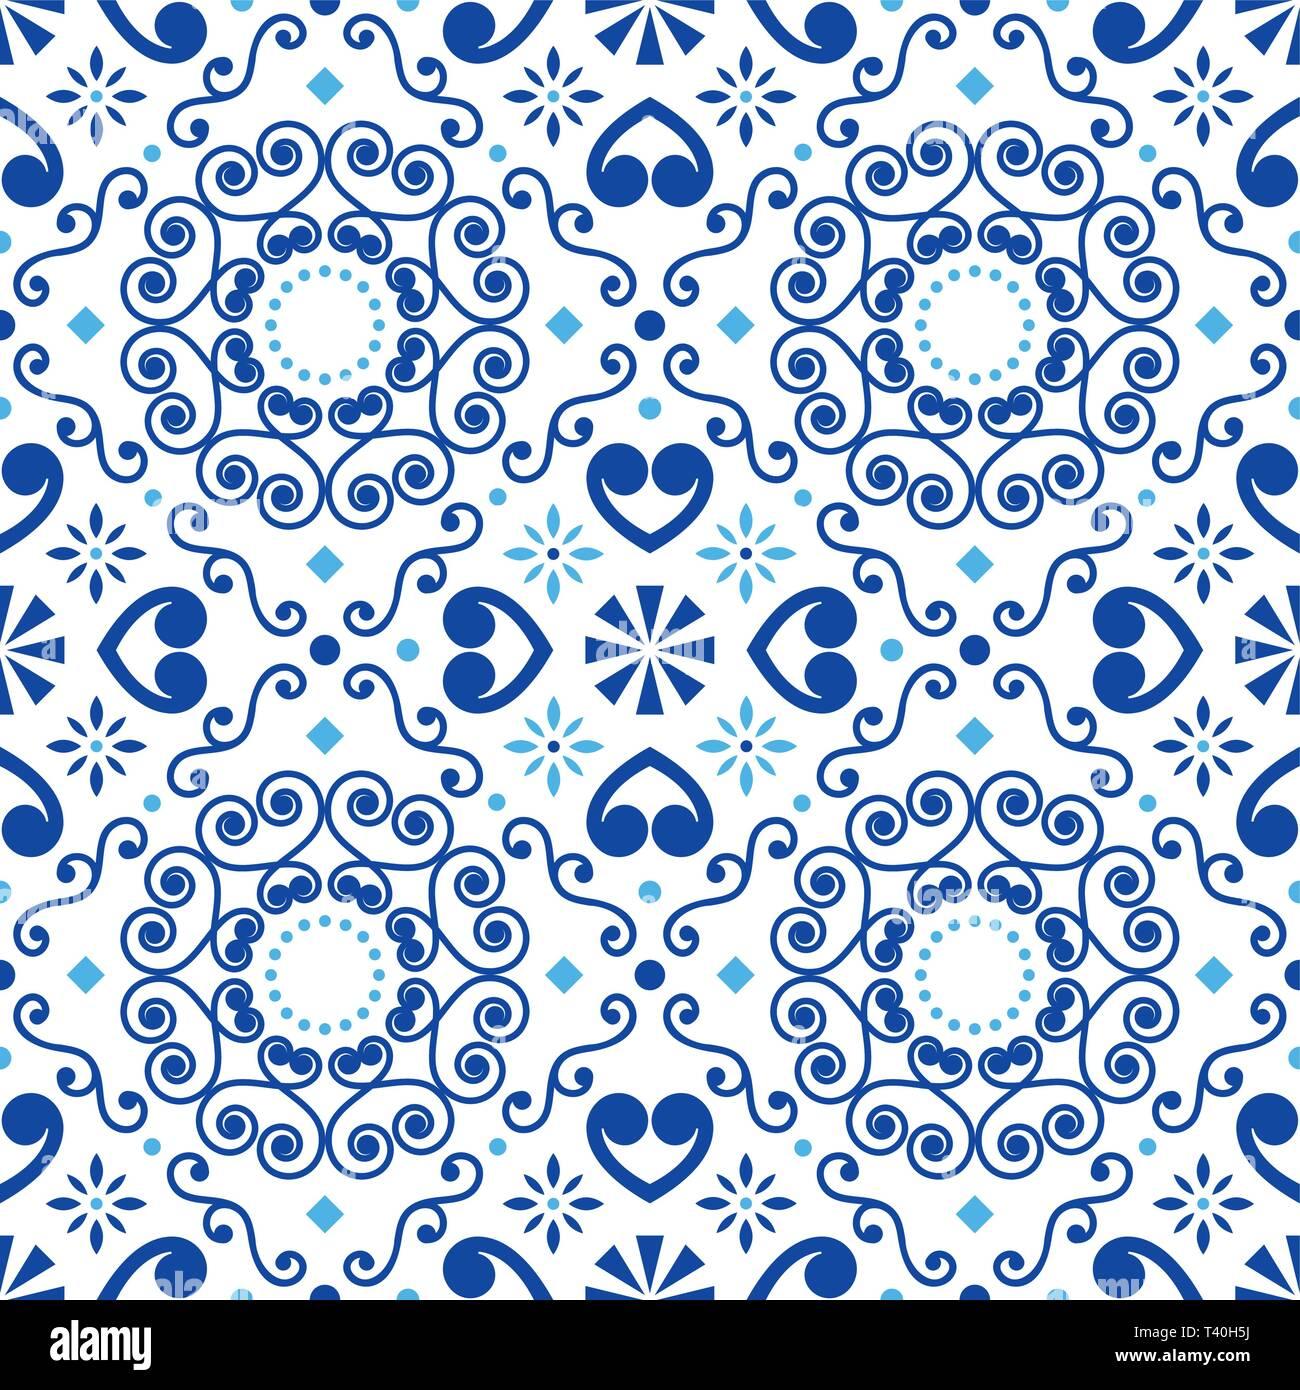 Portuguese or Spanish retro tile Azulejos vector seamless pattern, geometric repetitve design - textile or wallpaper background - Stock Vector